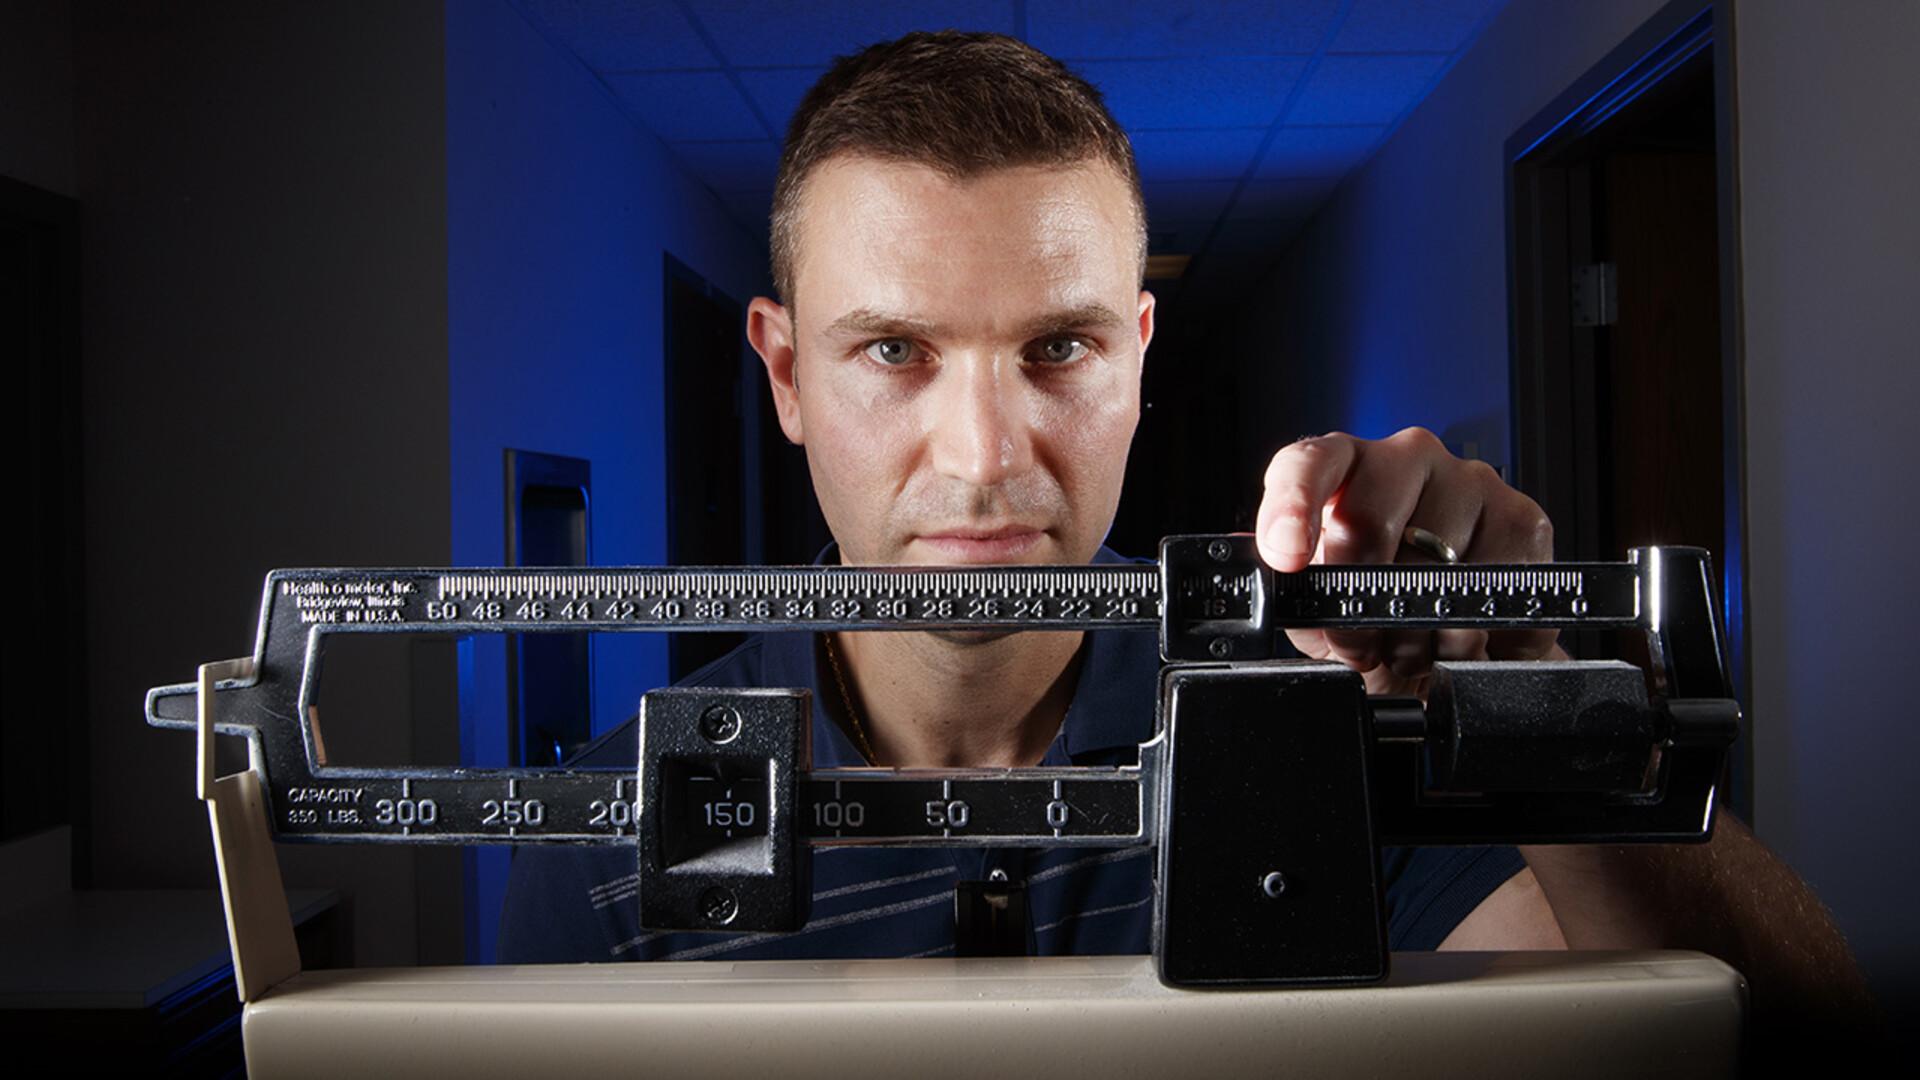 Nebraska researchers eye link between cognitive abilities, weight